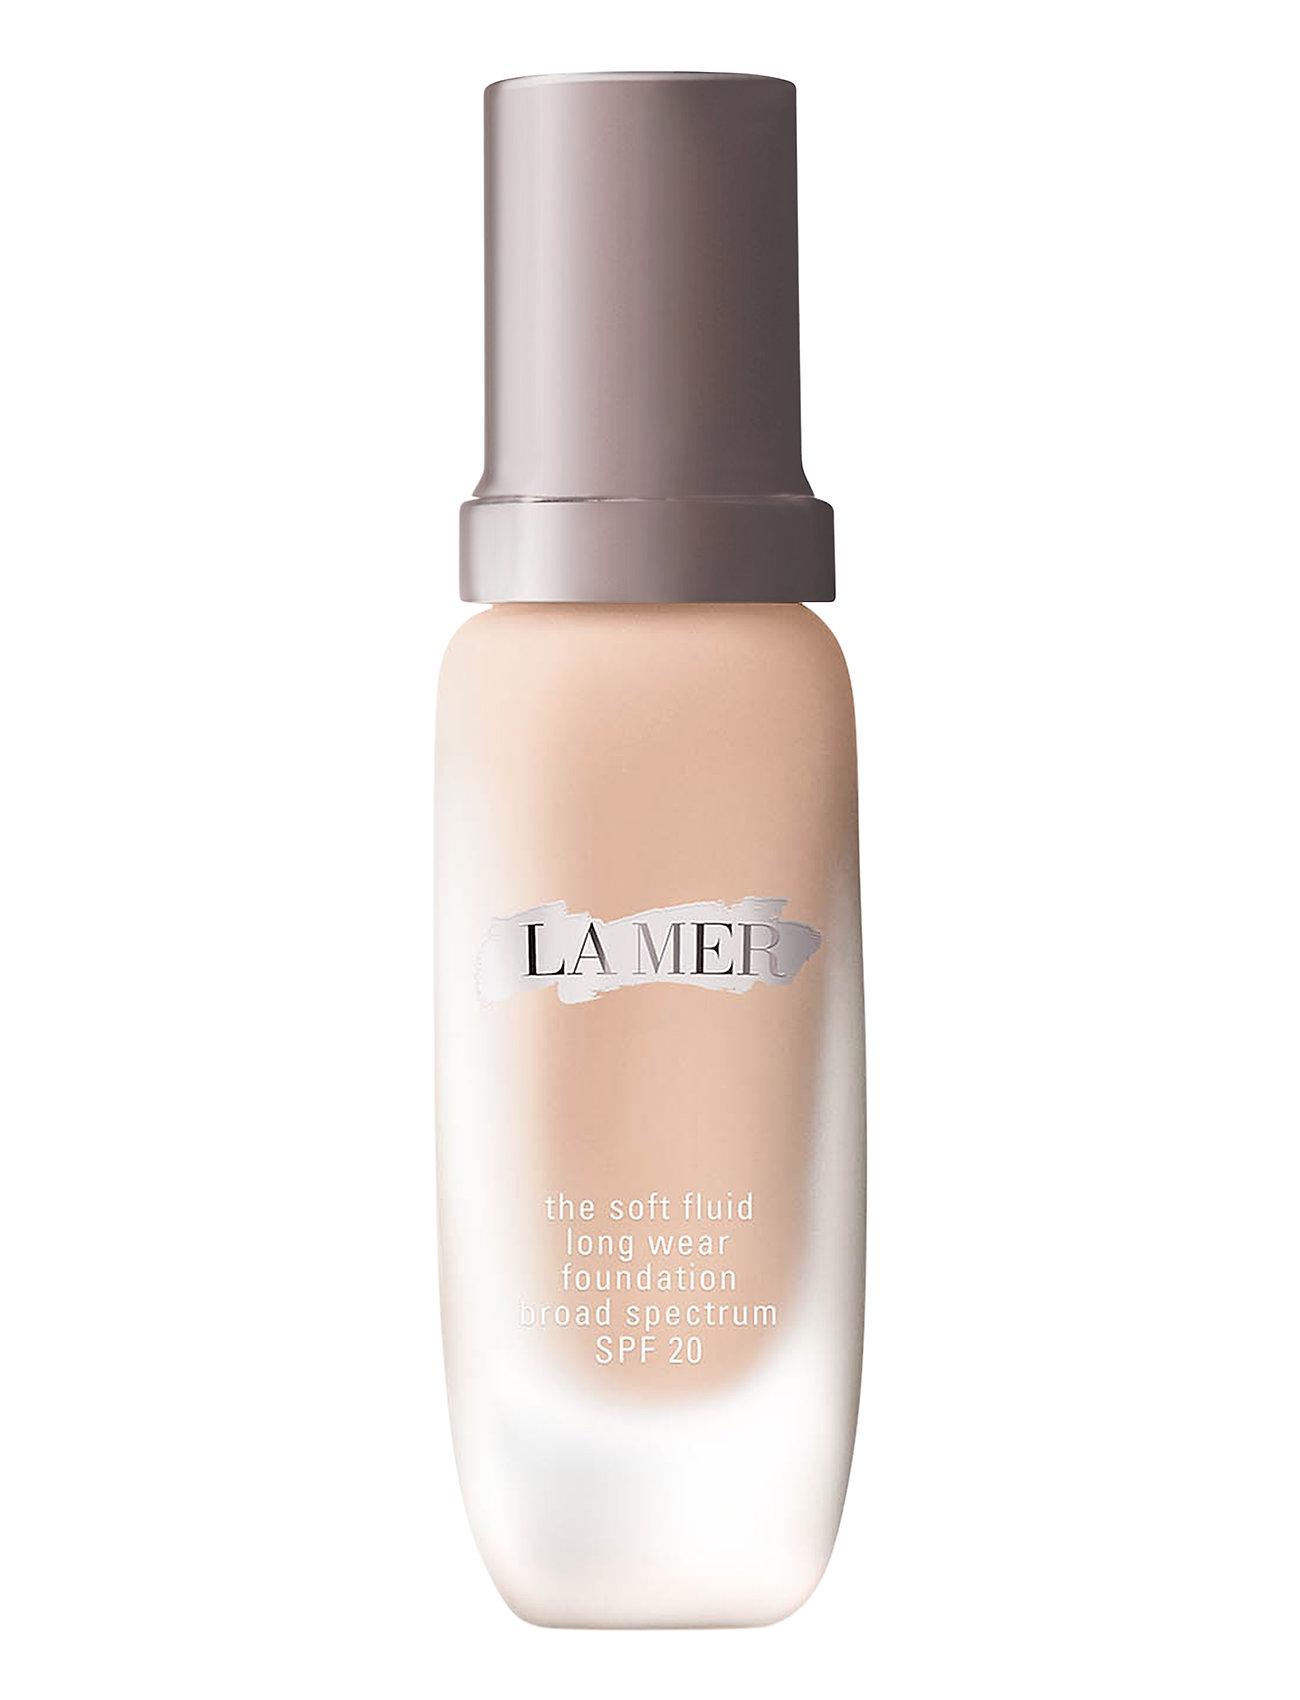 Image of The Soft Fluid Long Wear Foundation Spf20 Foundation Makeup La Mer (3421206765)